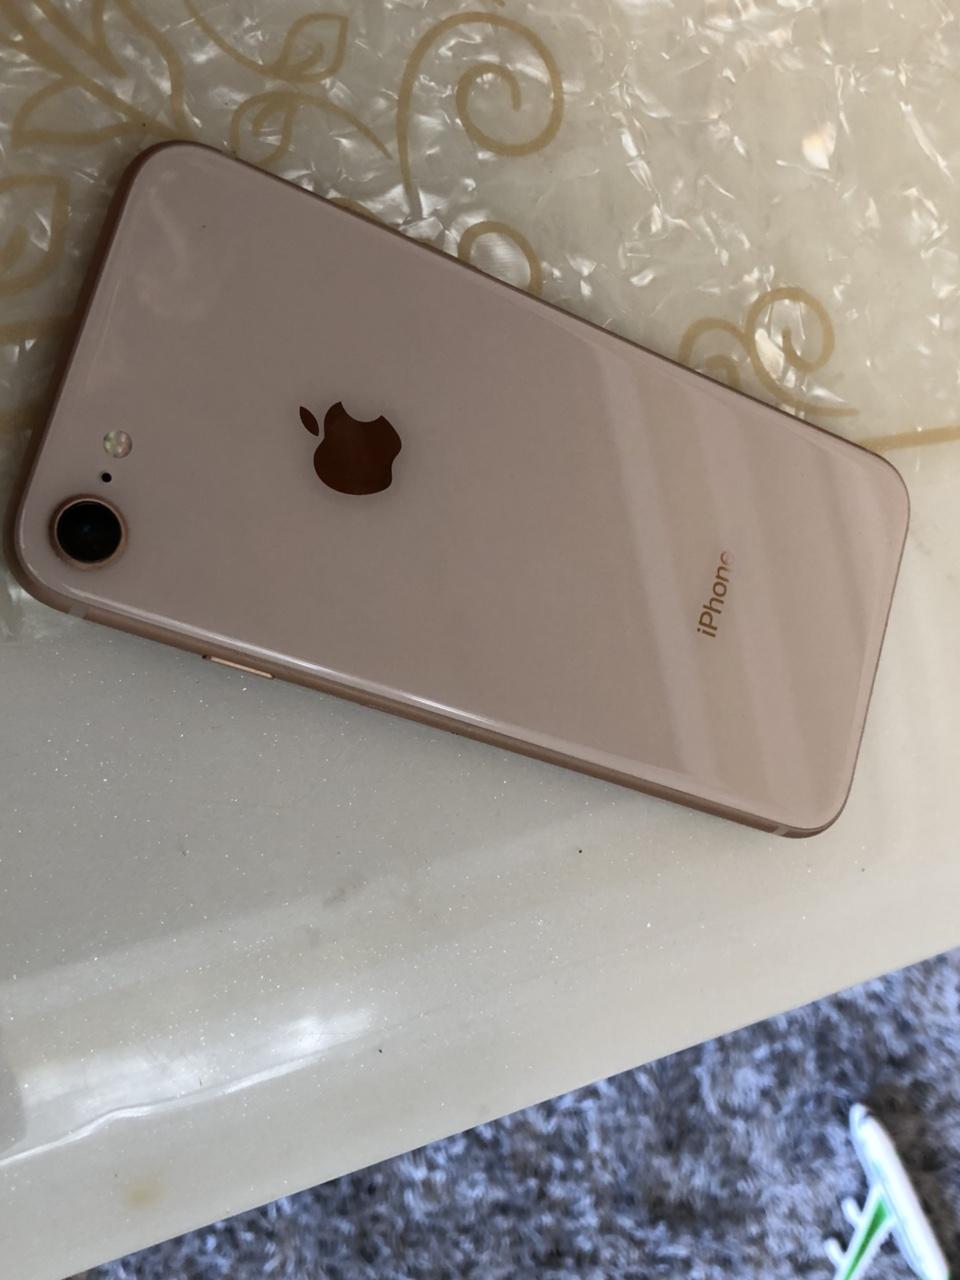 iPhone8 金色 64G  外观99新  无磕碰 保护的特别好,过保一个月 全网通